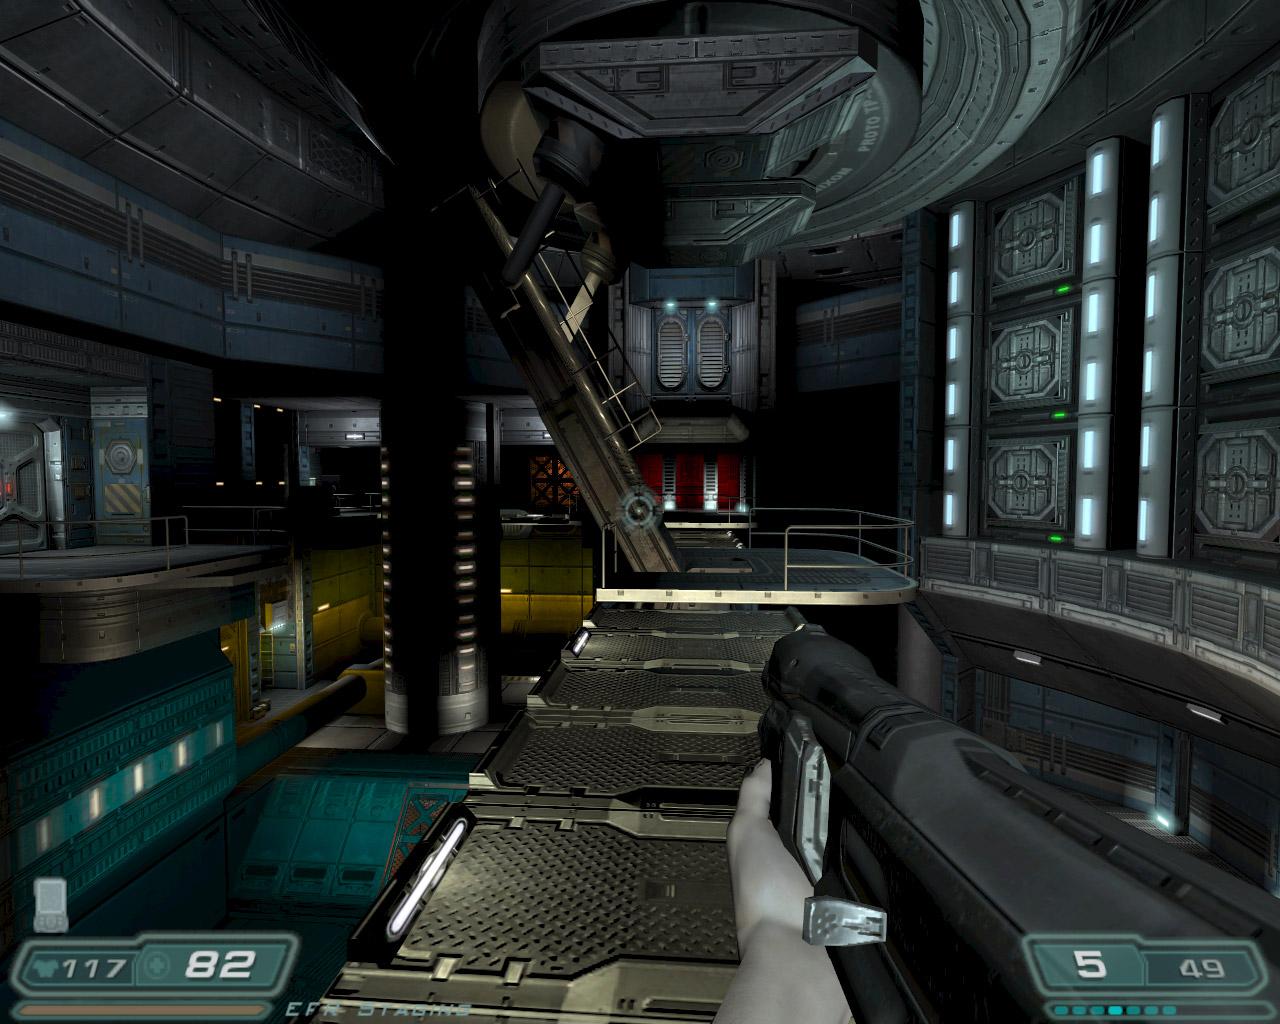 Doom pc game download full version | Doom Eternal Download